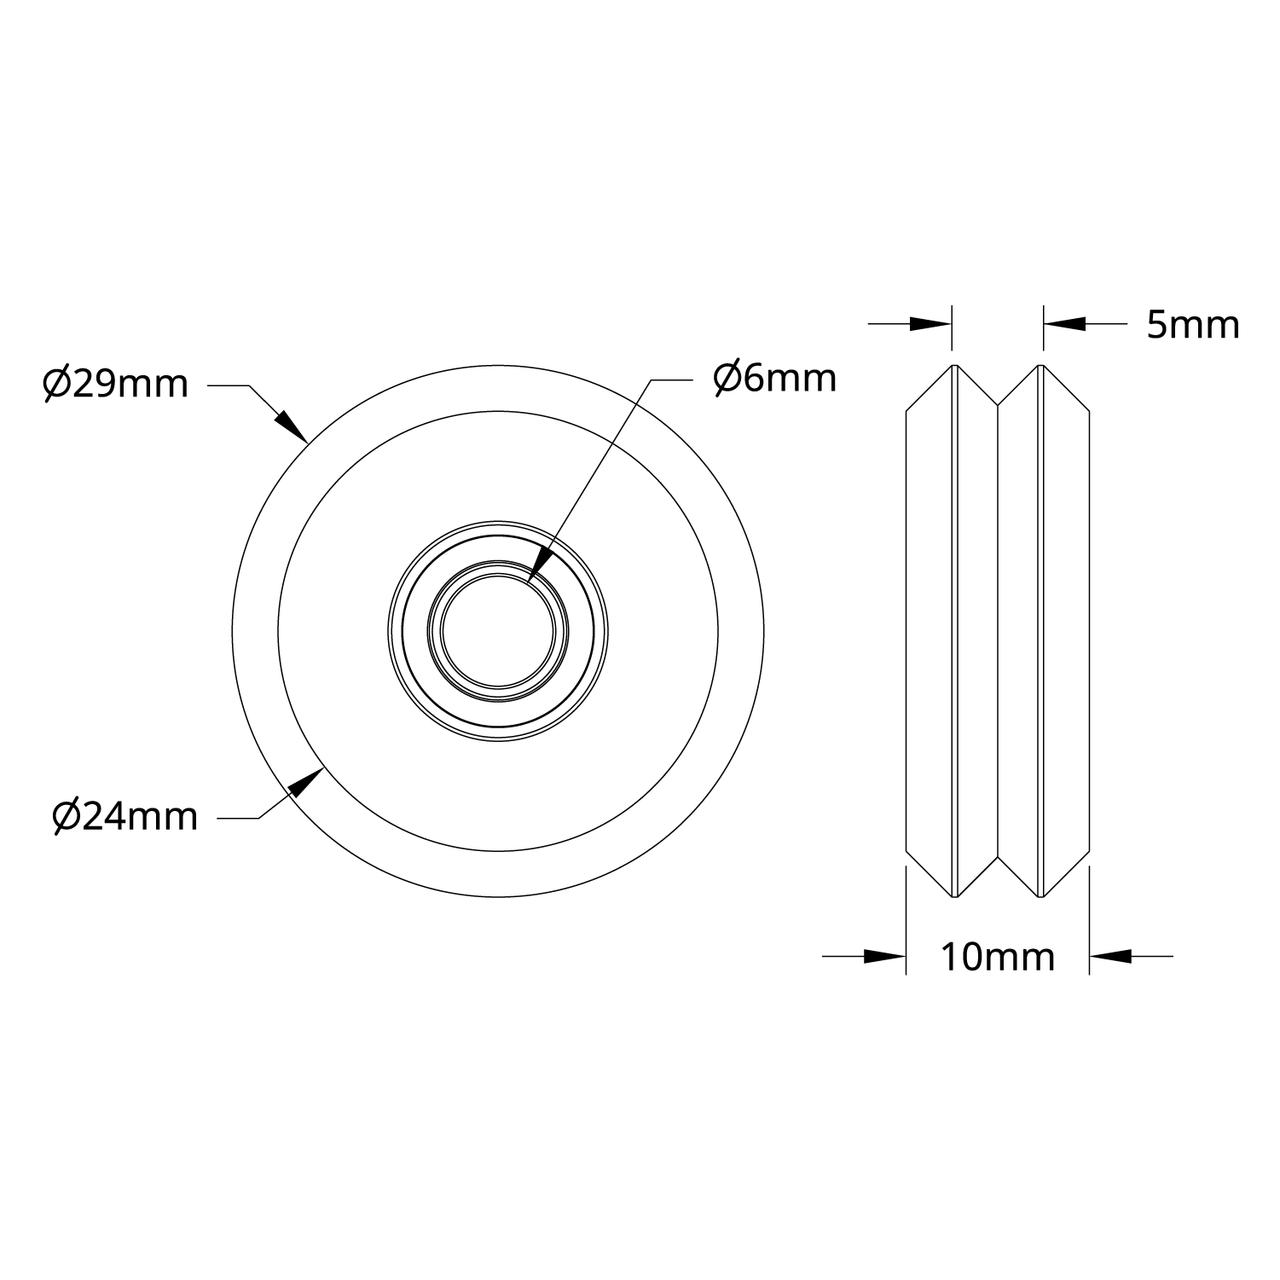 hight resolution of  29mm 3600 0006 2910 schematic